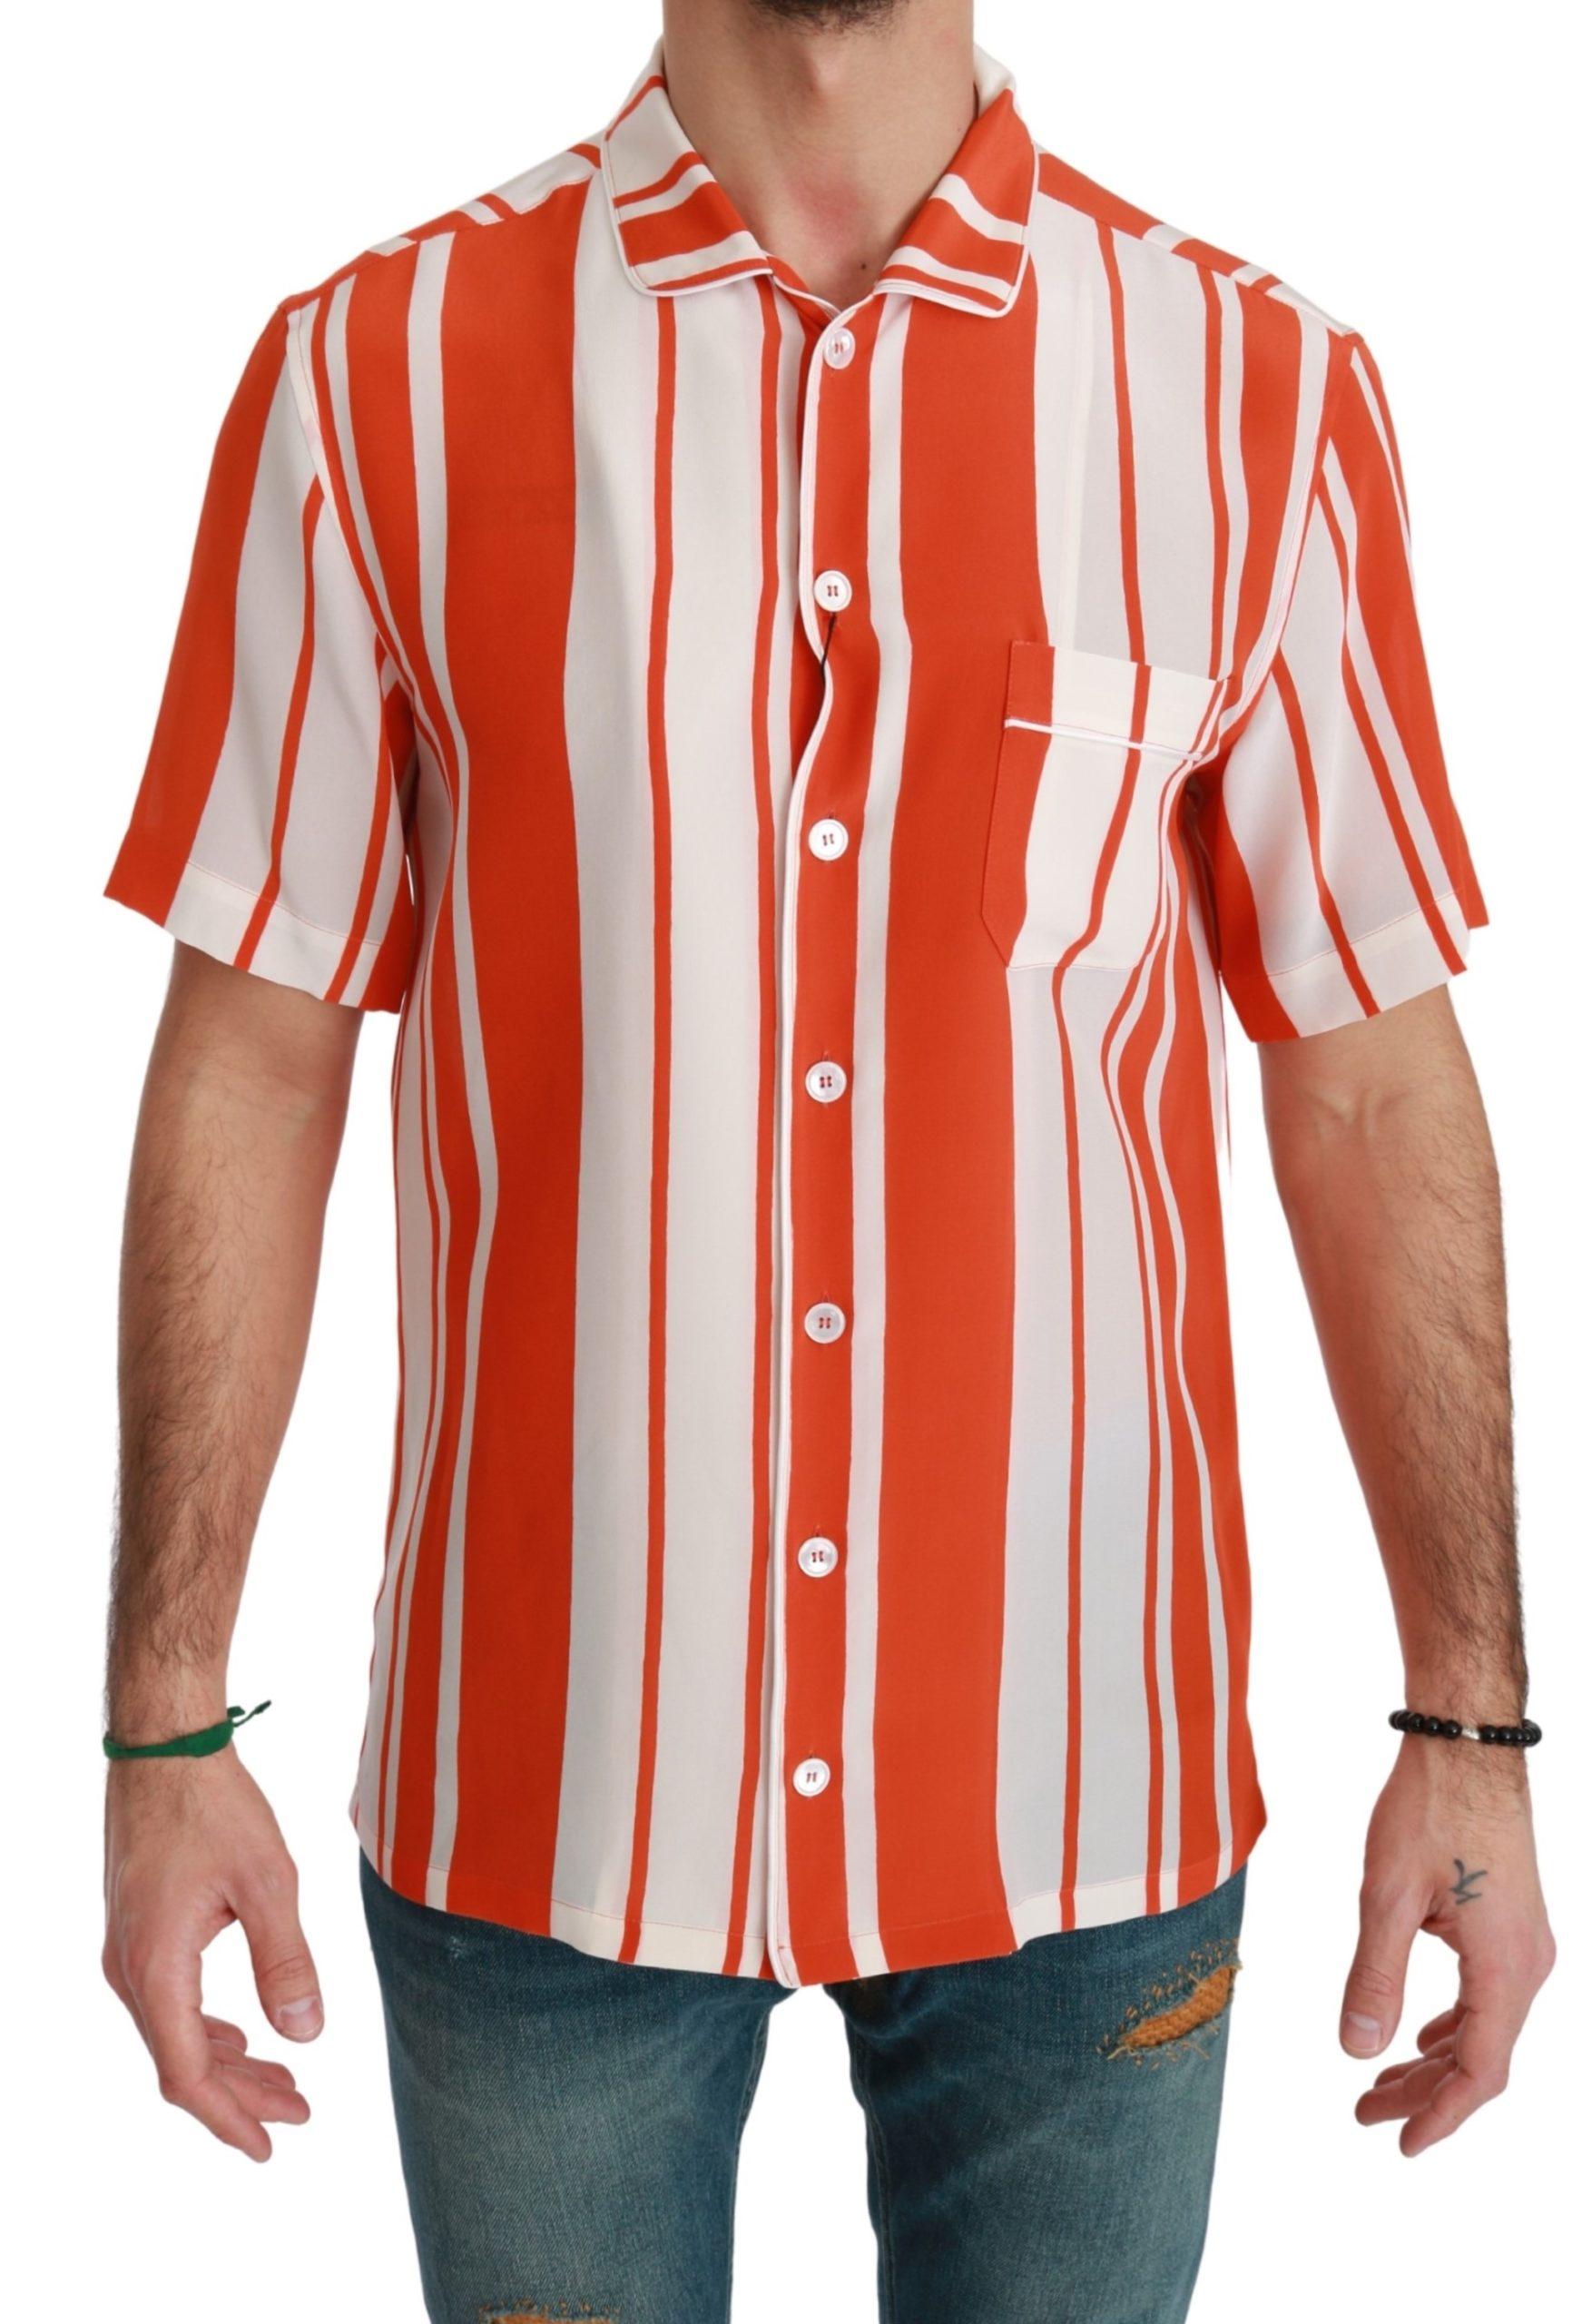 Dolce & Gabbana Men's Silk Striped Short Sleeve Shirt Orange TSH4655 - IT38   XS